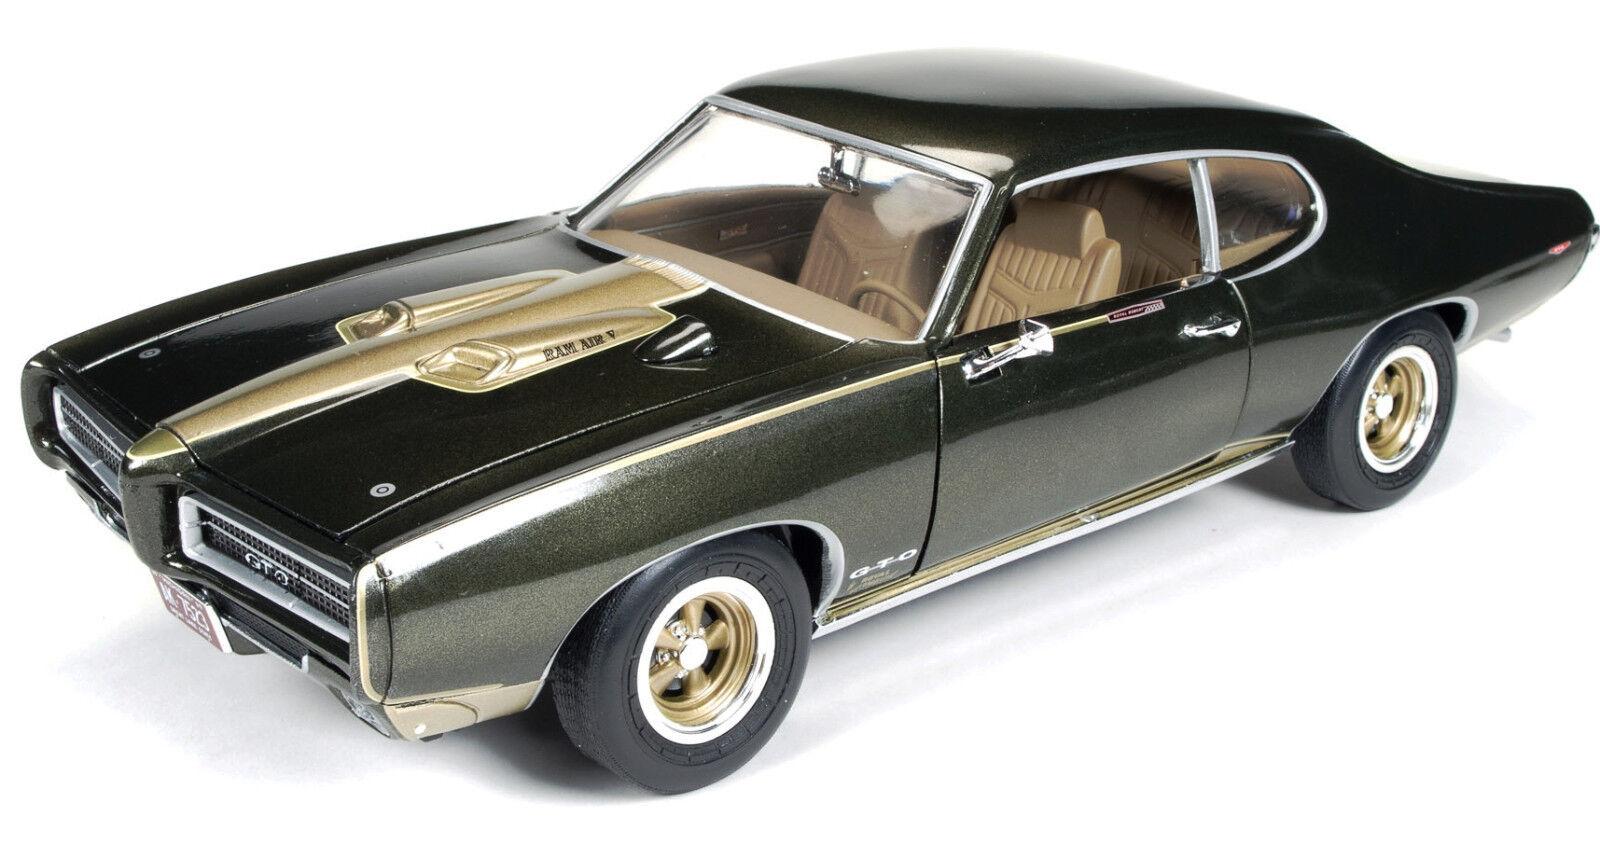 1969 pontiac gto royal bobcat braun   Gold - metallic - 1,18 auto - welt 1042